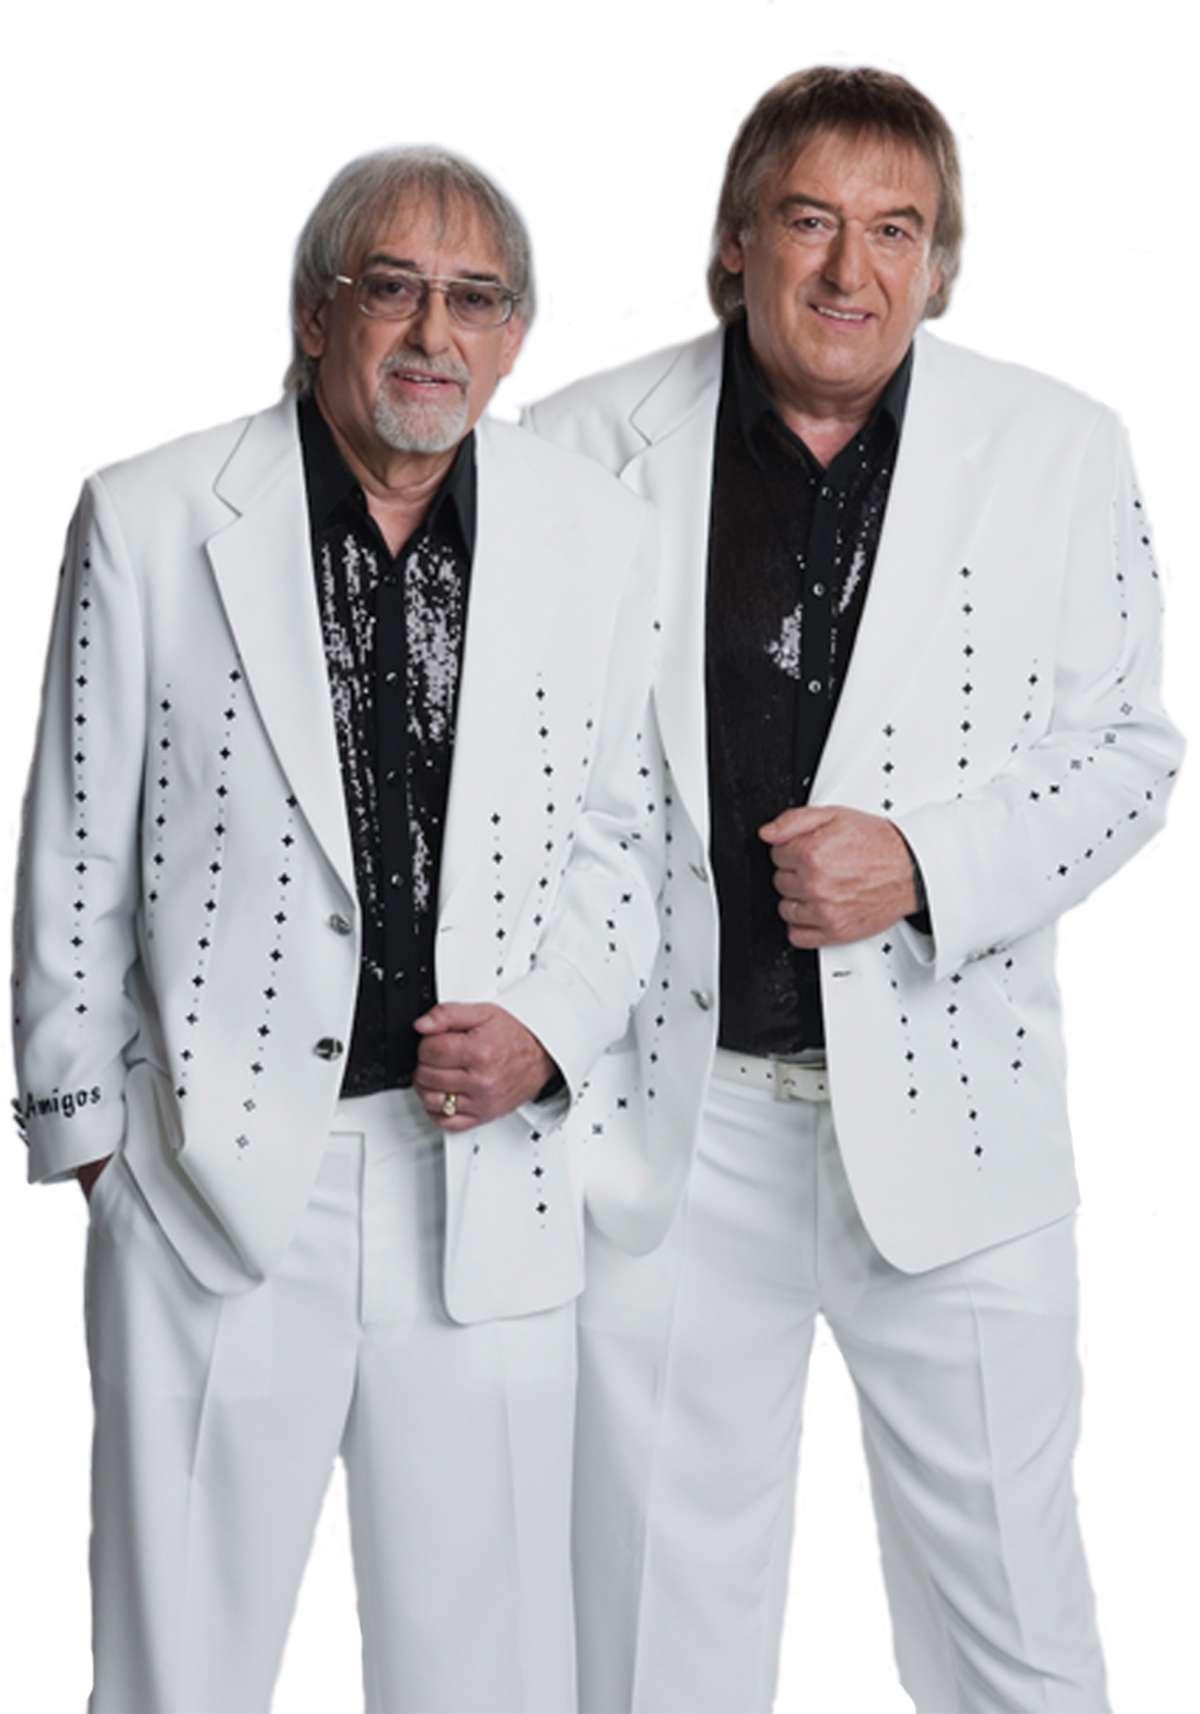 50 Jahre Tour - Amigos - Erwin-Piscator-Haus - Stadthalle  - Marburg